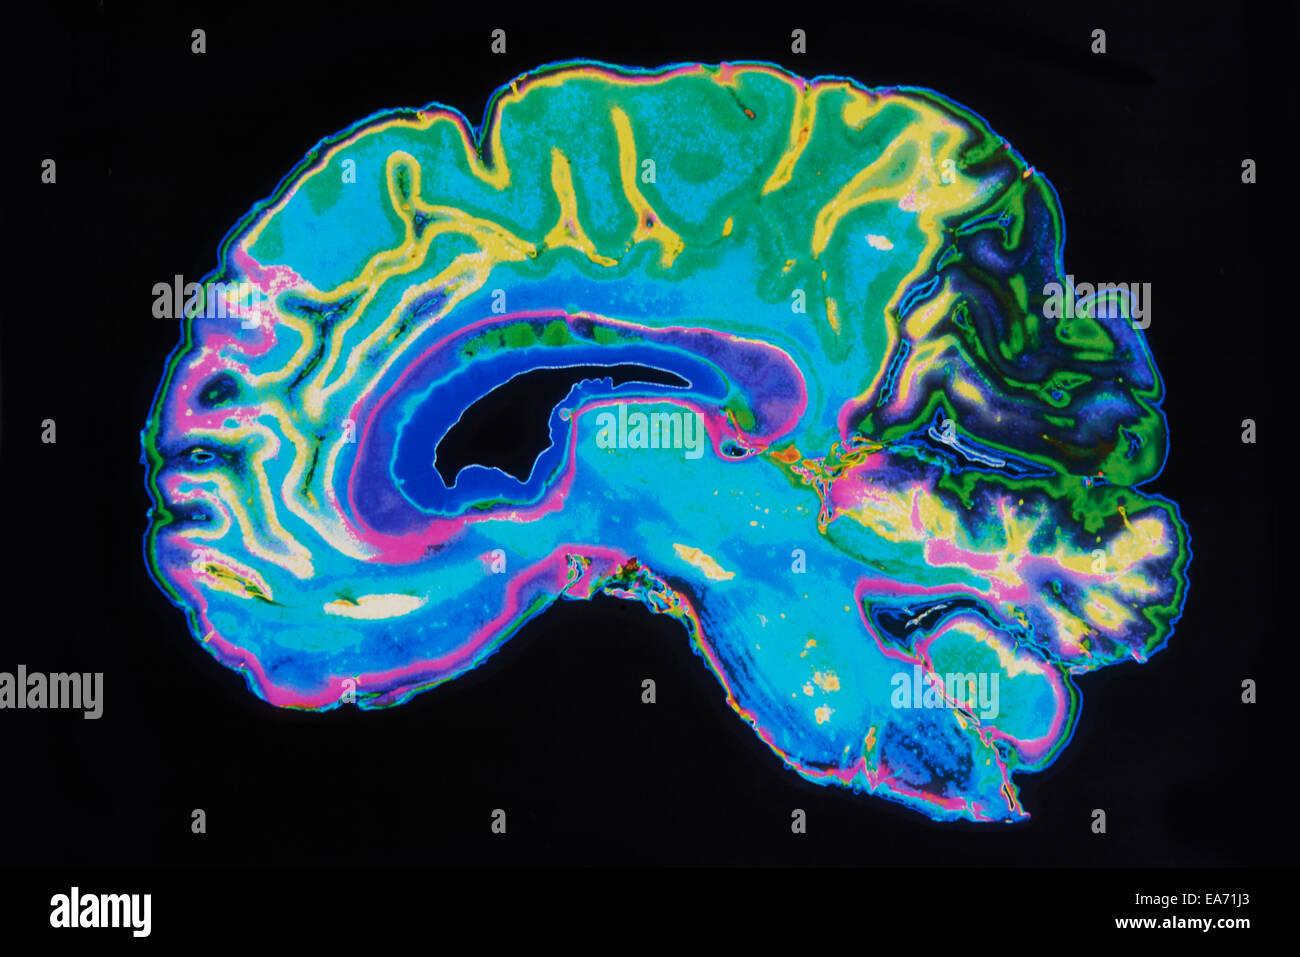 MRI Image Brain On Black Background Stock Photo